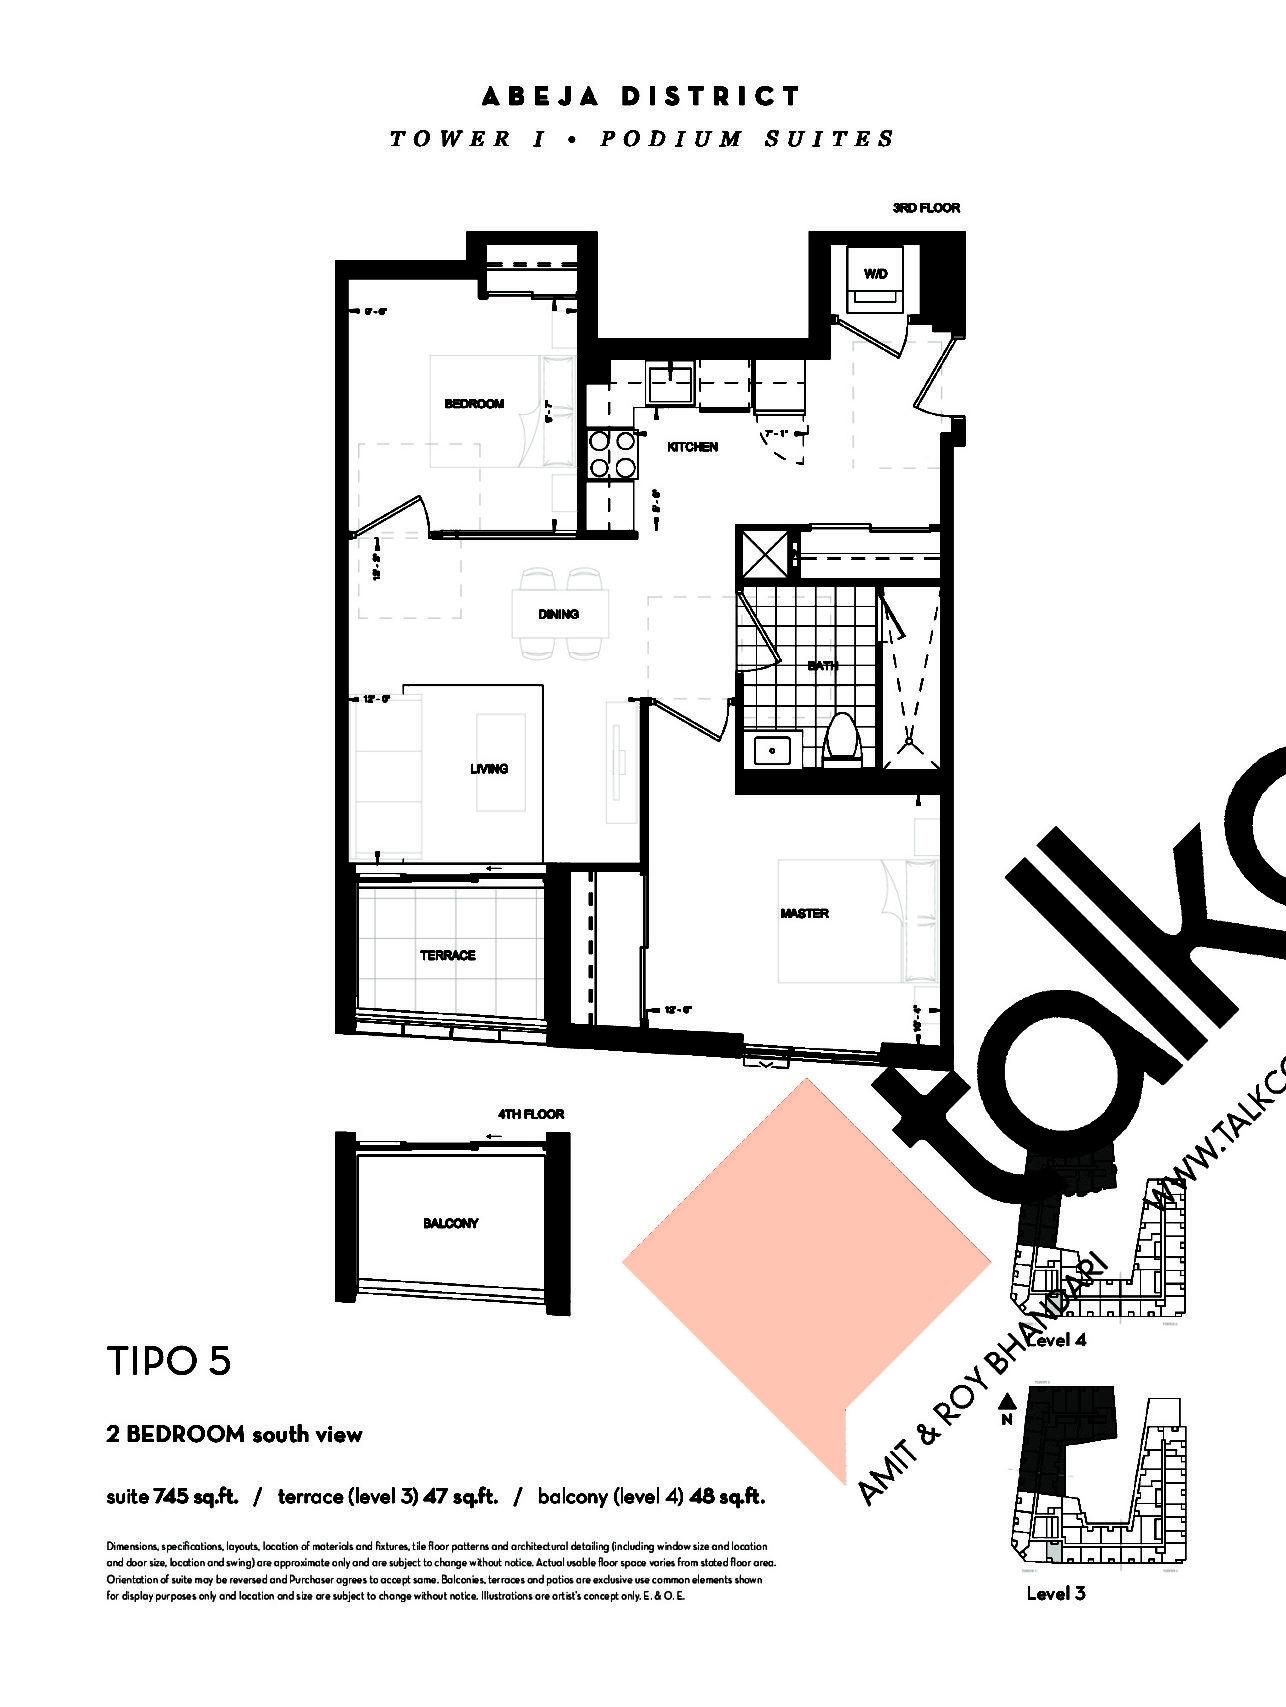 TIPO 5 (Podium) Floor Plan at Abeja District Condos - 745 sq.ft